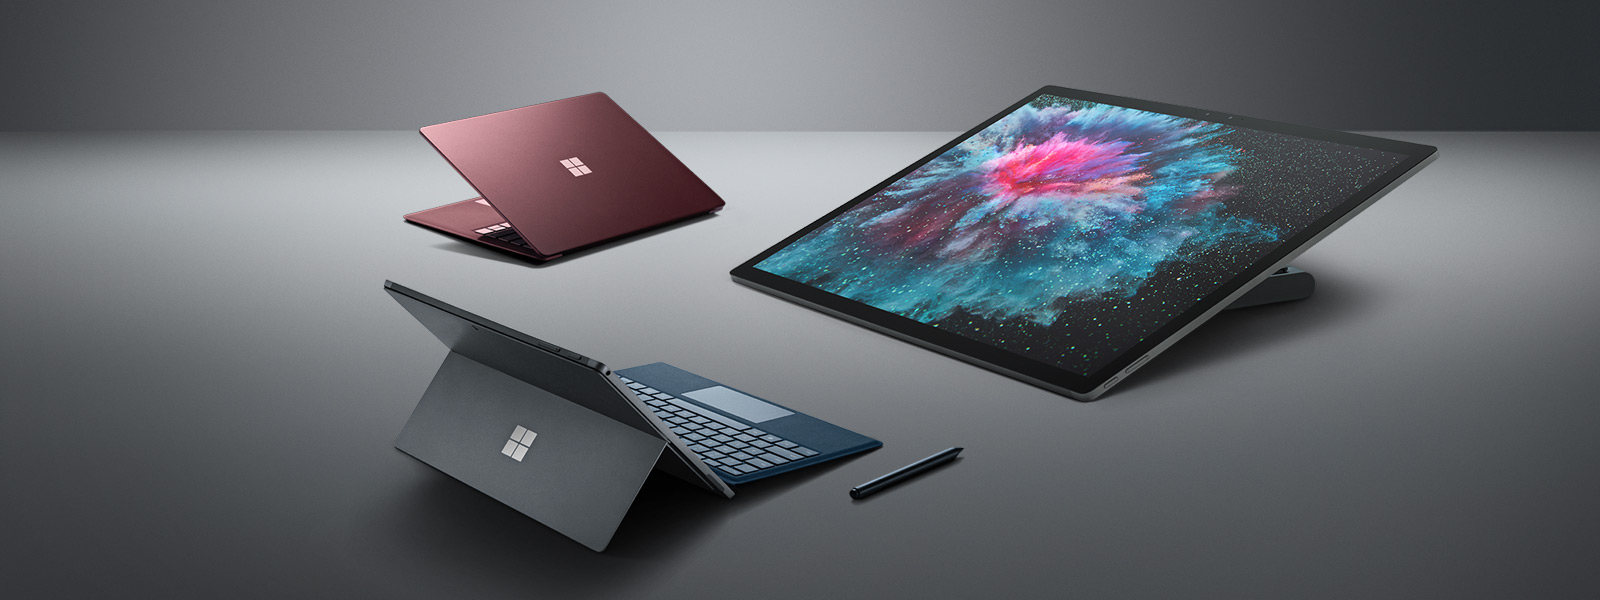 Surface Laptop 2, Surface Pro 6, Surface Studio 2